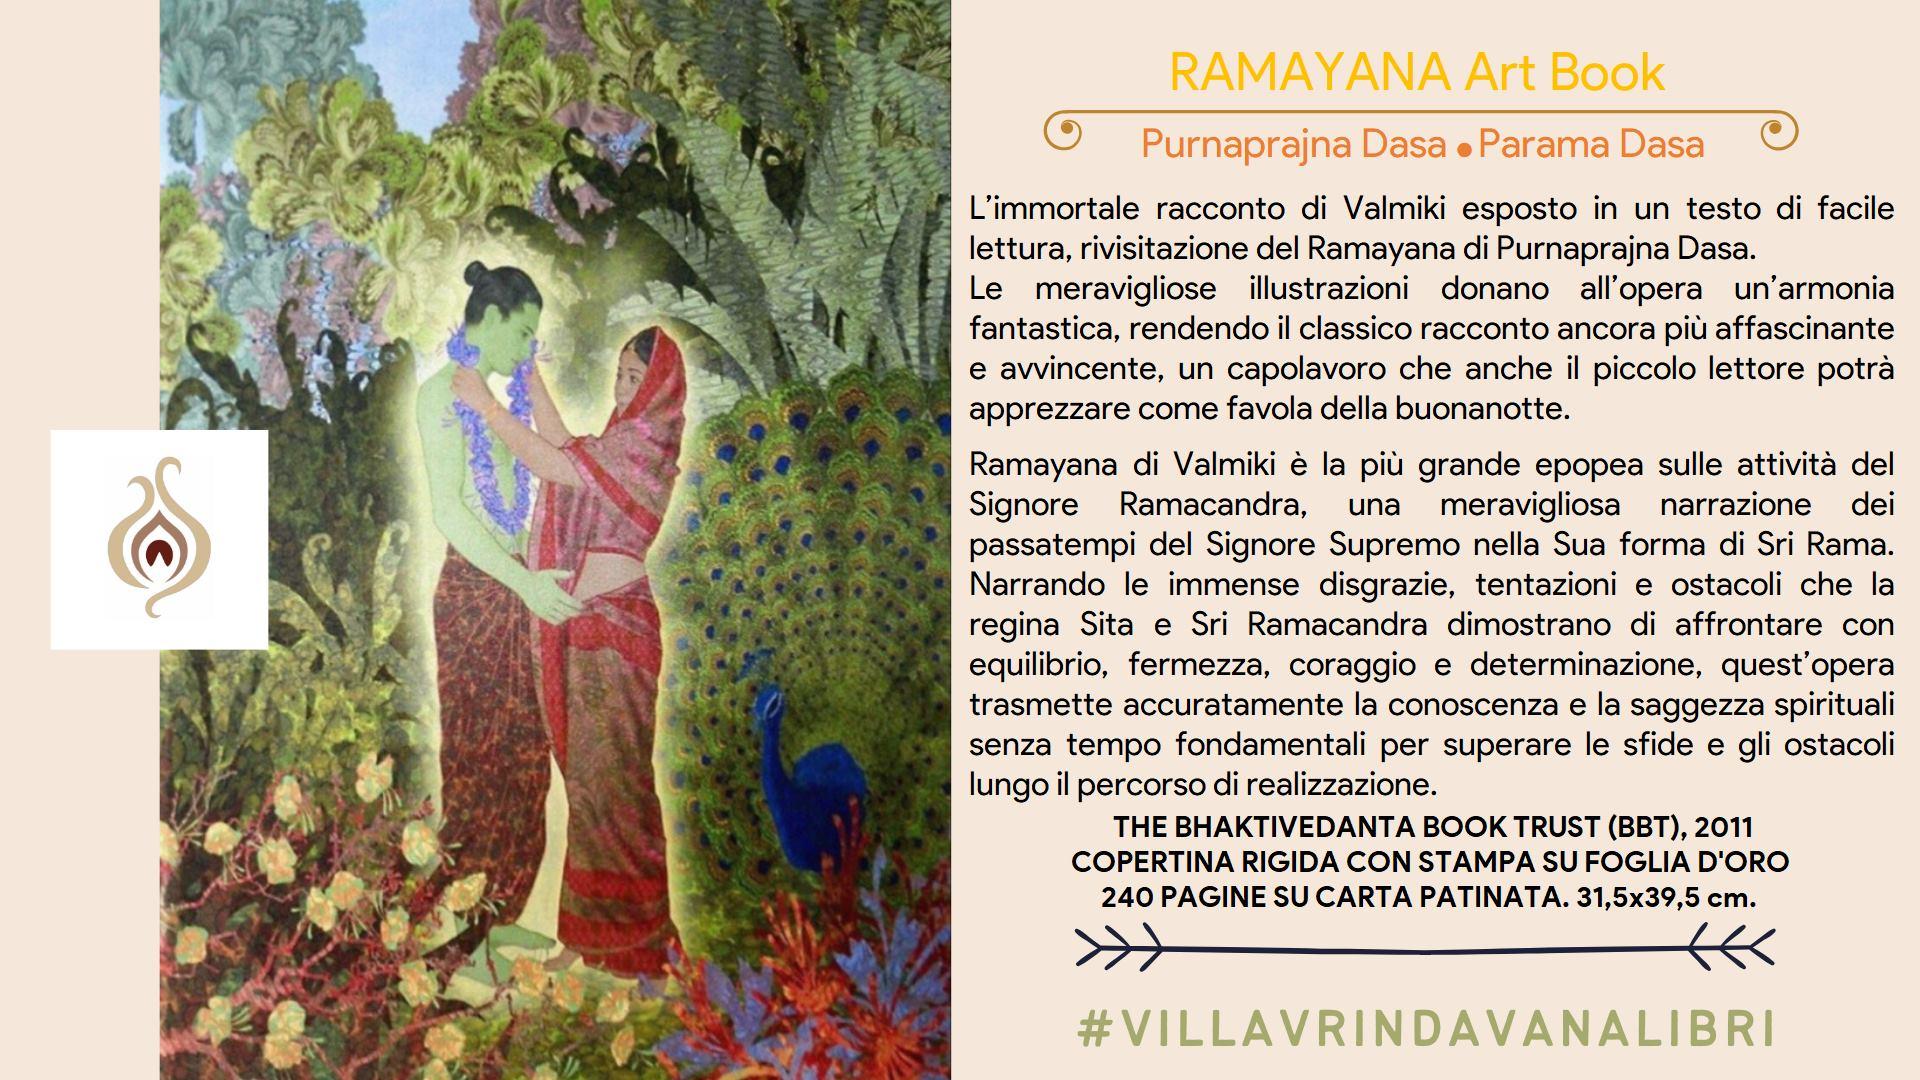 Ramayana Art Book